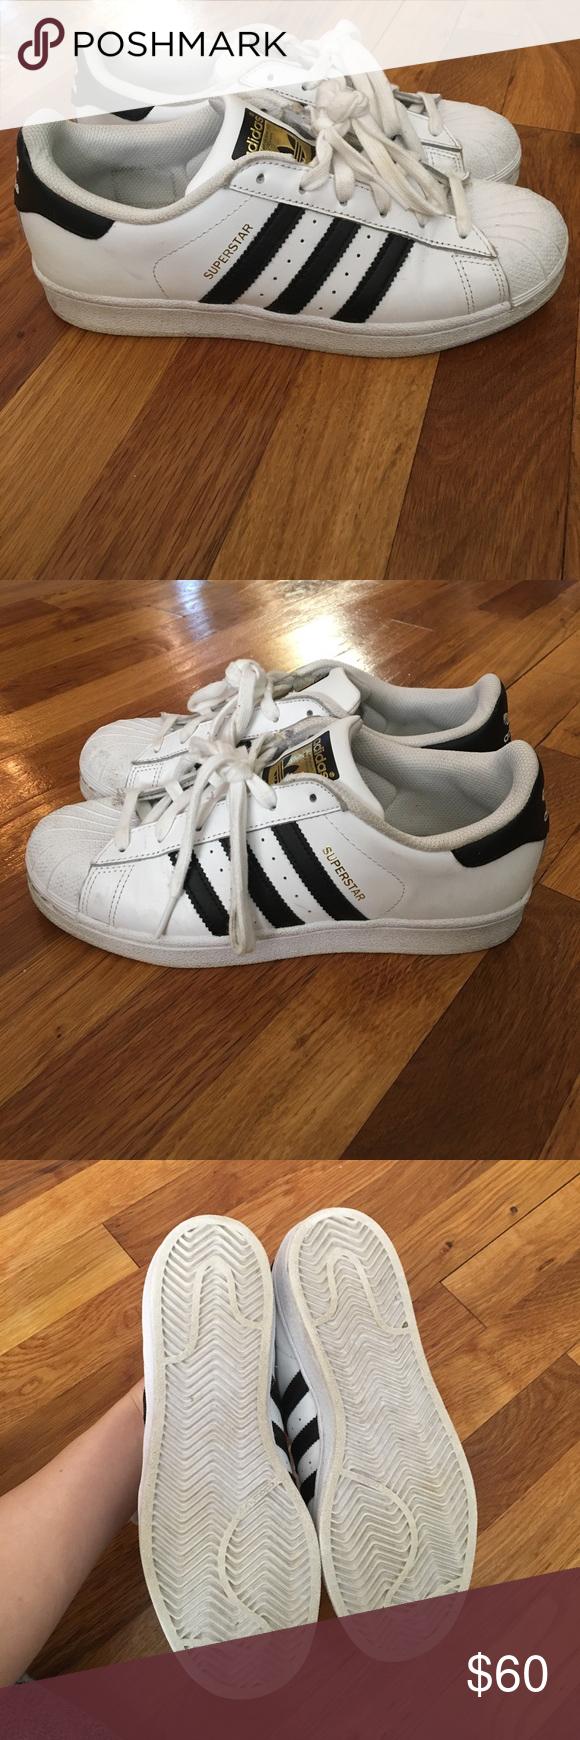 adidas superstar adidas superstar 8 bambini, scarpe taglia 6